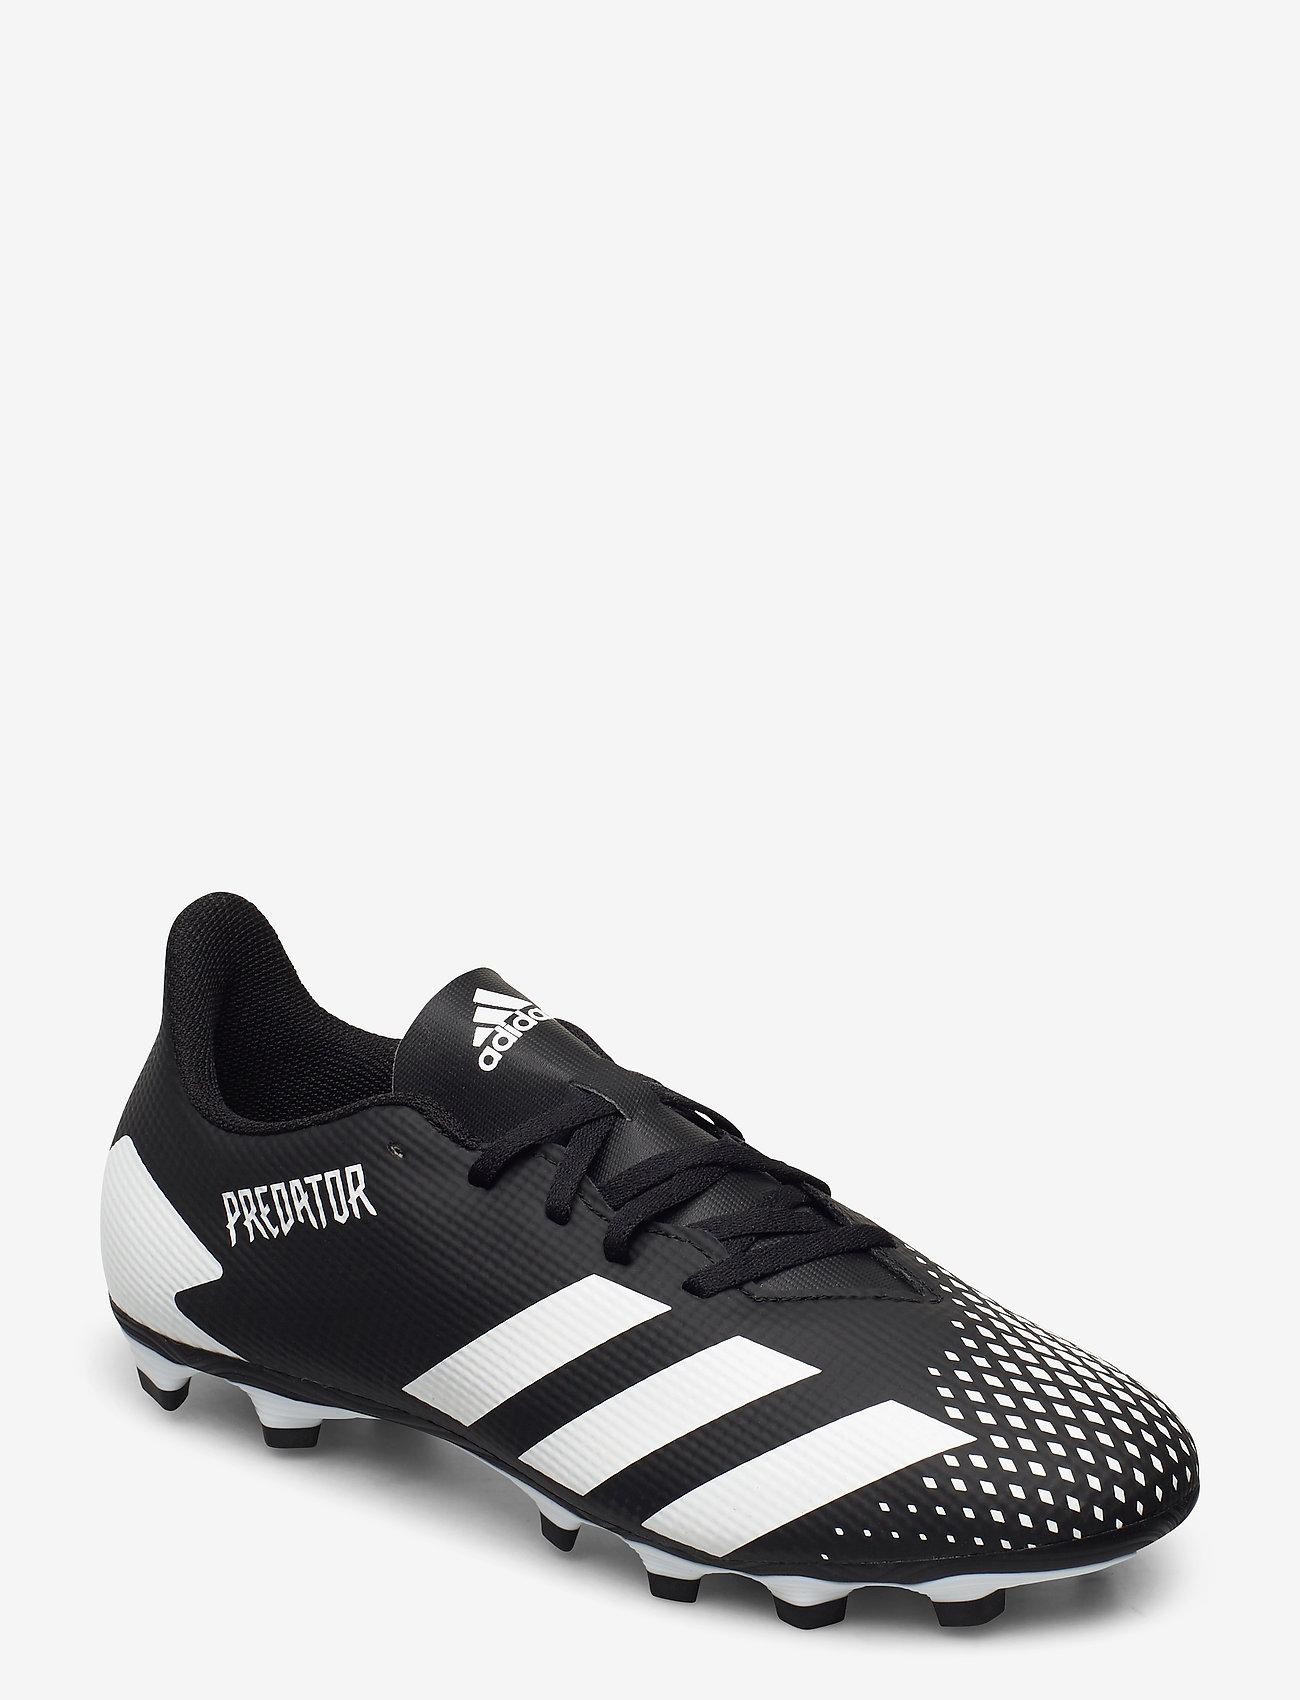 adidas Performance - PREDATOR 20.4 FxG - fotbollsskor - cblack/ftwwht/cblack - 0